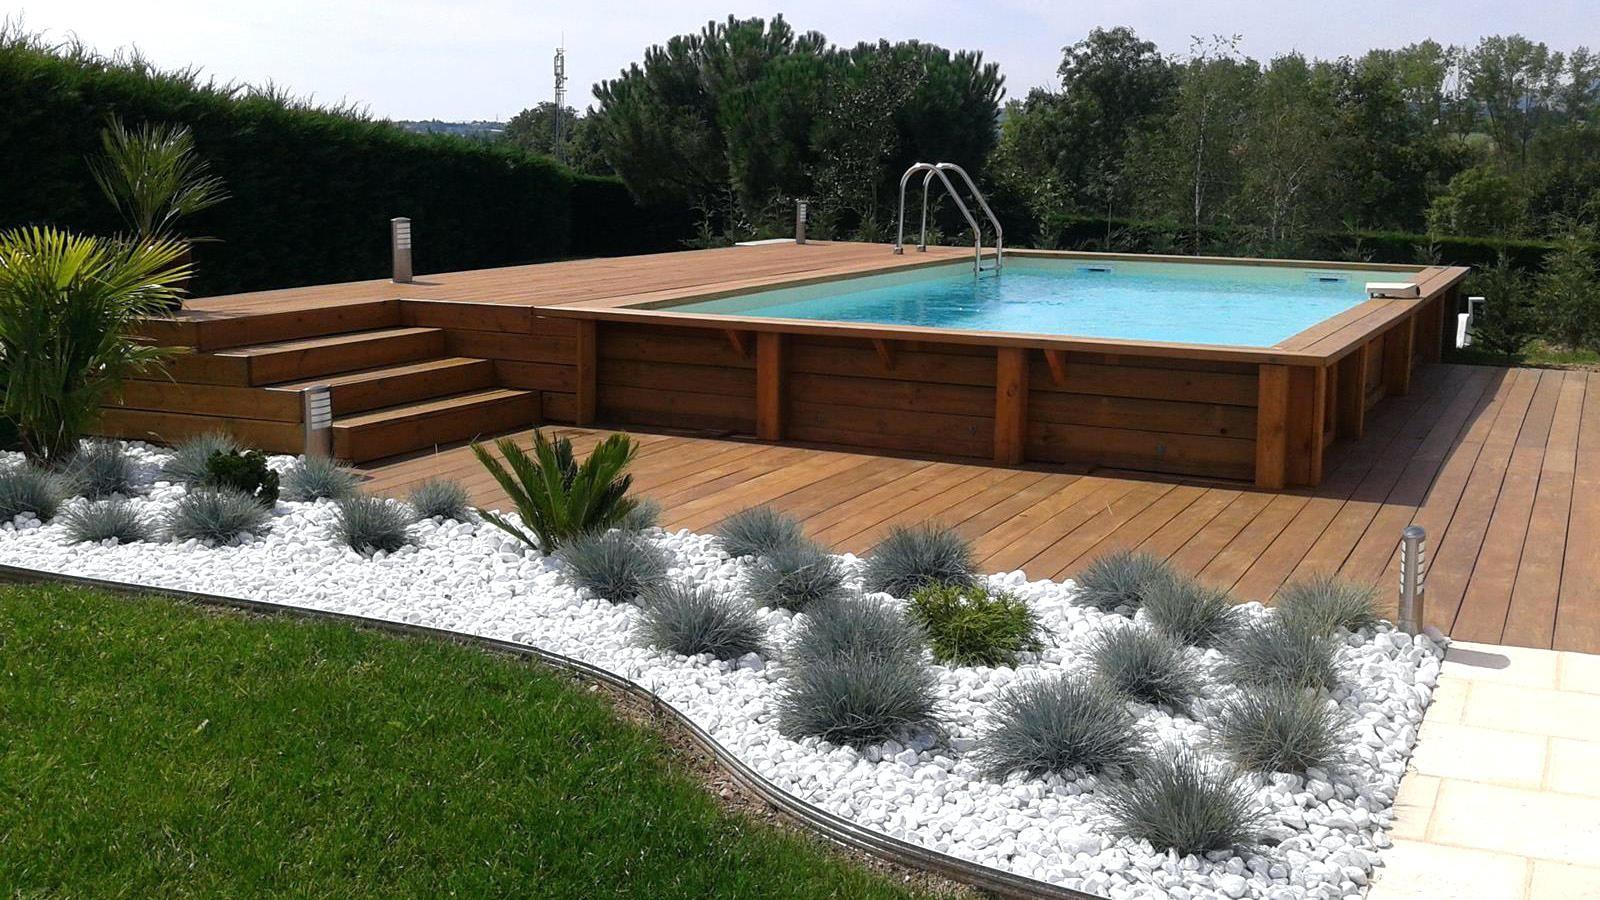 terrasse bois piscine hors sol et enterrace exemple